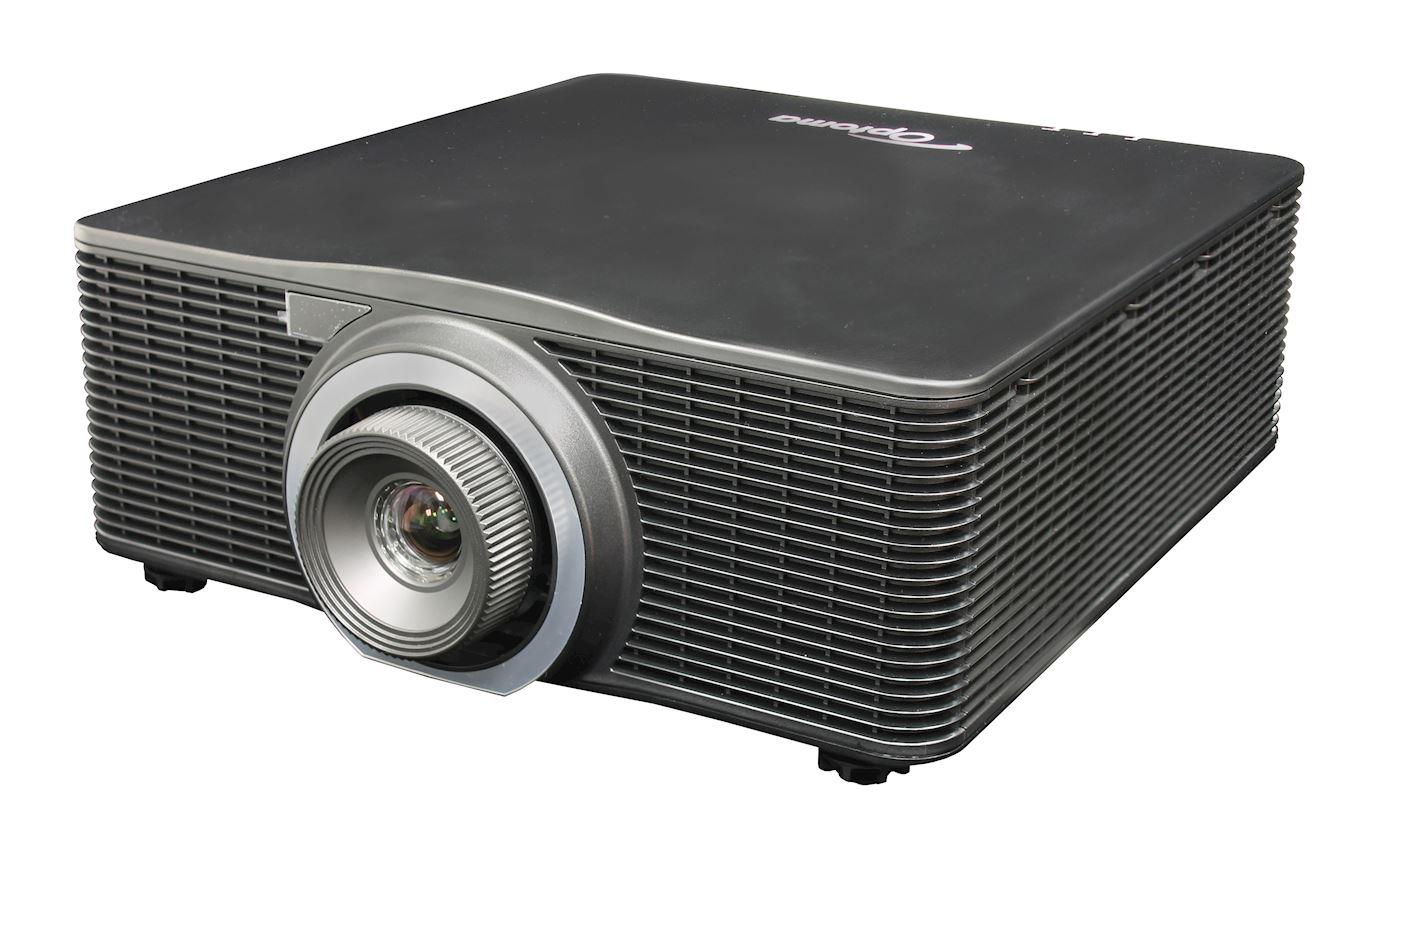 Optoma ZU850 8000lm WUXGA DLP Laser Projector, Refurbished